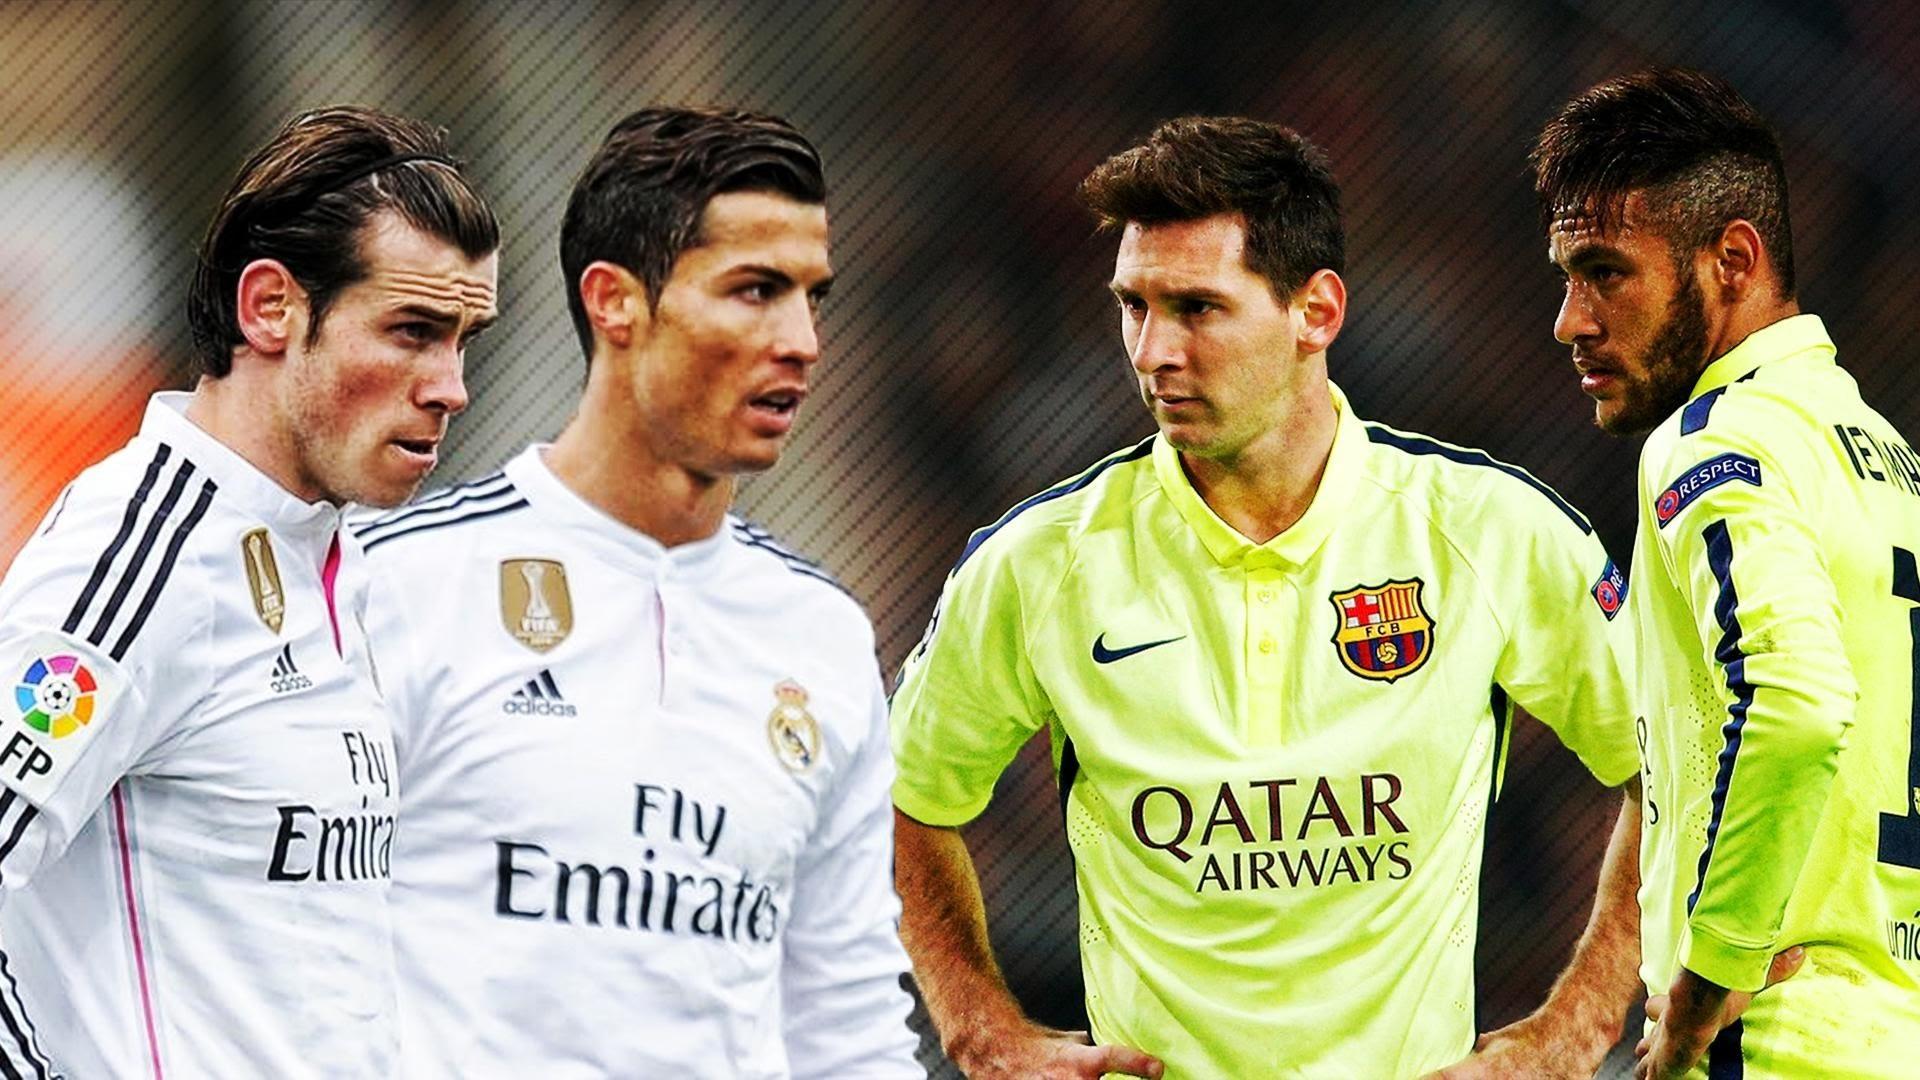 Lionel Messi & Neymar vs Ronaldo & Bale 2015 ○ Skills & Goals Battle | HD –  YouTube